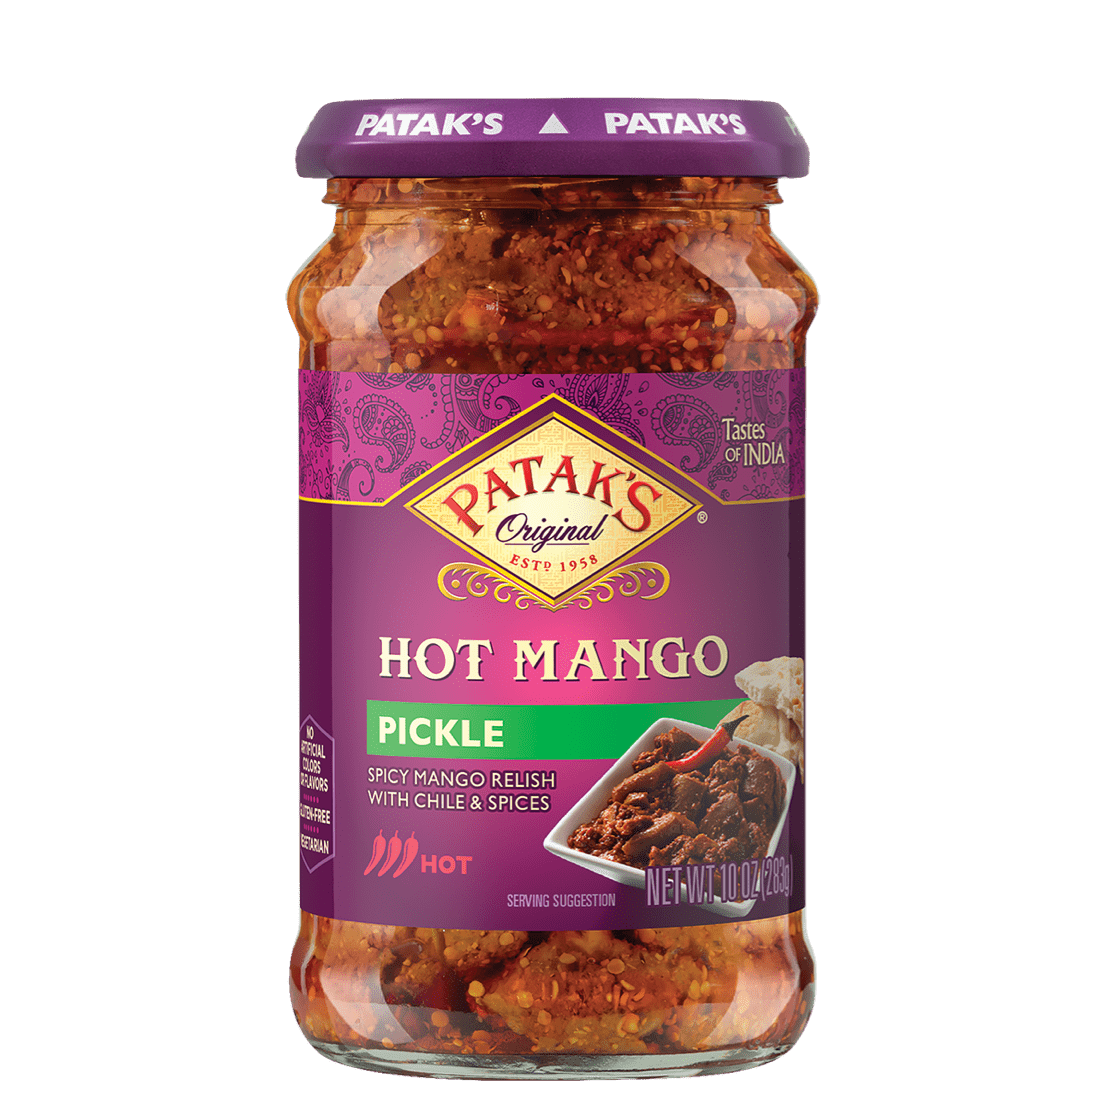 Hot mango pickle 2x